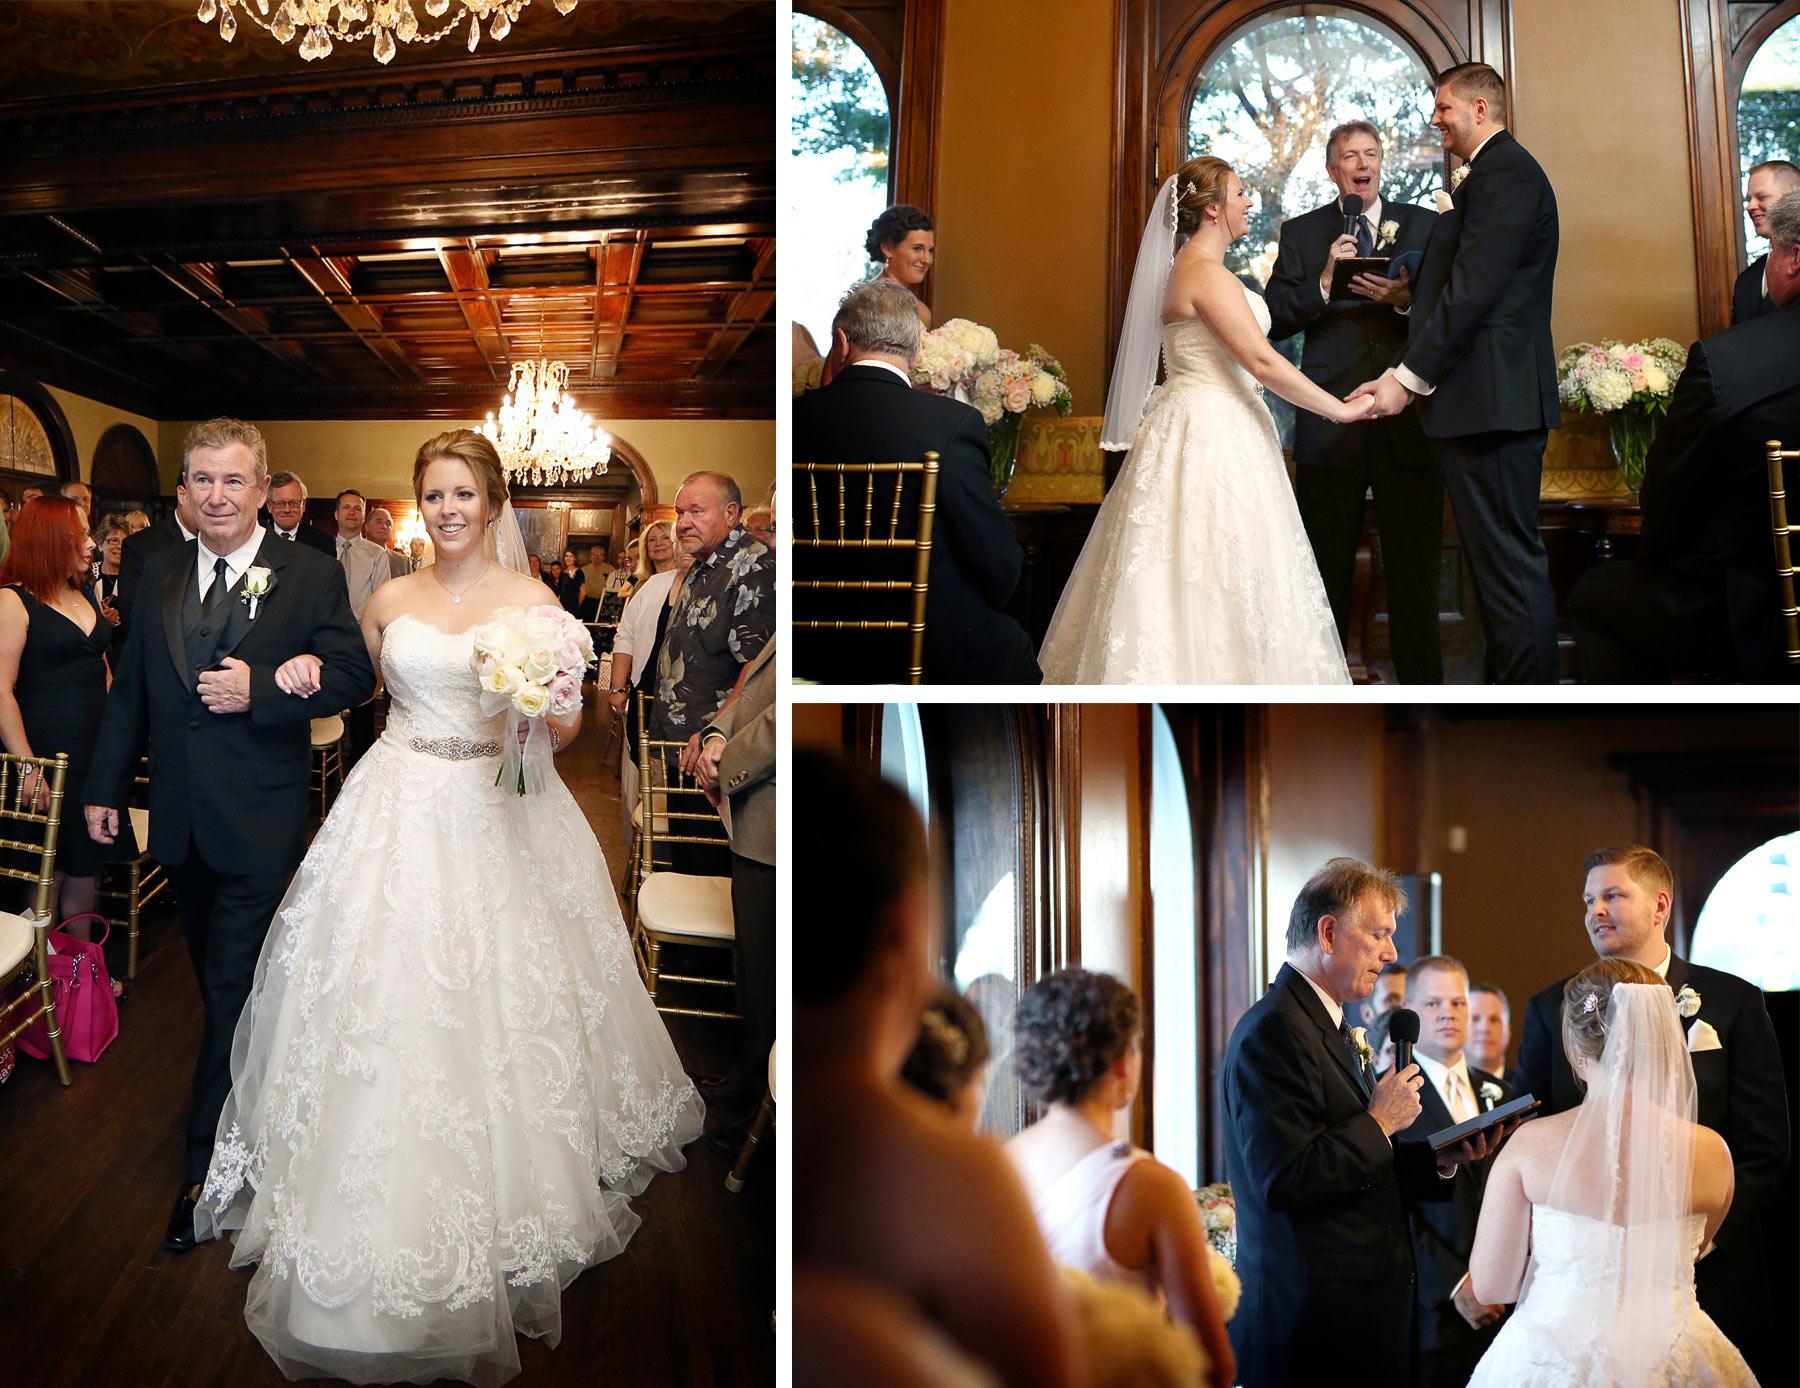 13-Minneapolis-Minnesota-Wedding-Photography-by-Vick-Photography-Semple-Mansion-Ceremony-Caitlin-&-Derrick.jpg